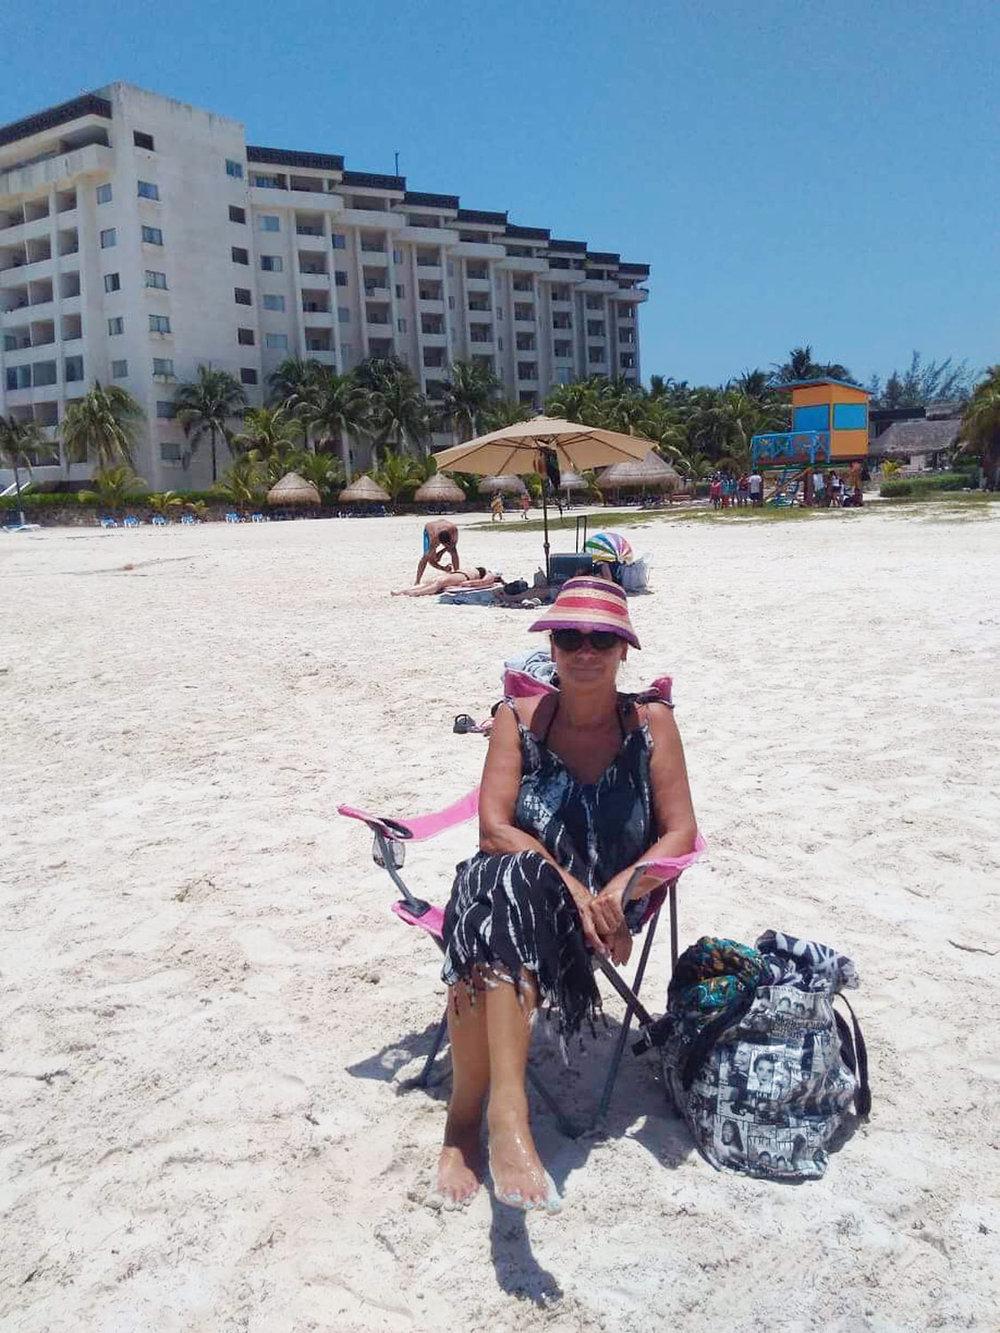 Hammocks_and_Ruins_Blog_Riviera_Maya_Mexico_Travel_Discover_Explore_Yucatan_Hammocks_Beaches_Near_Cancun_Playa_Langosta_28.jpg